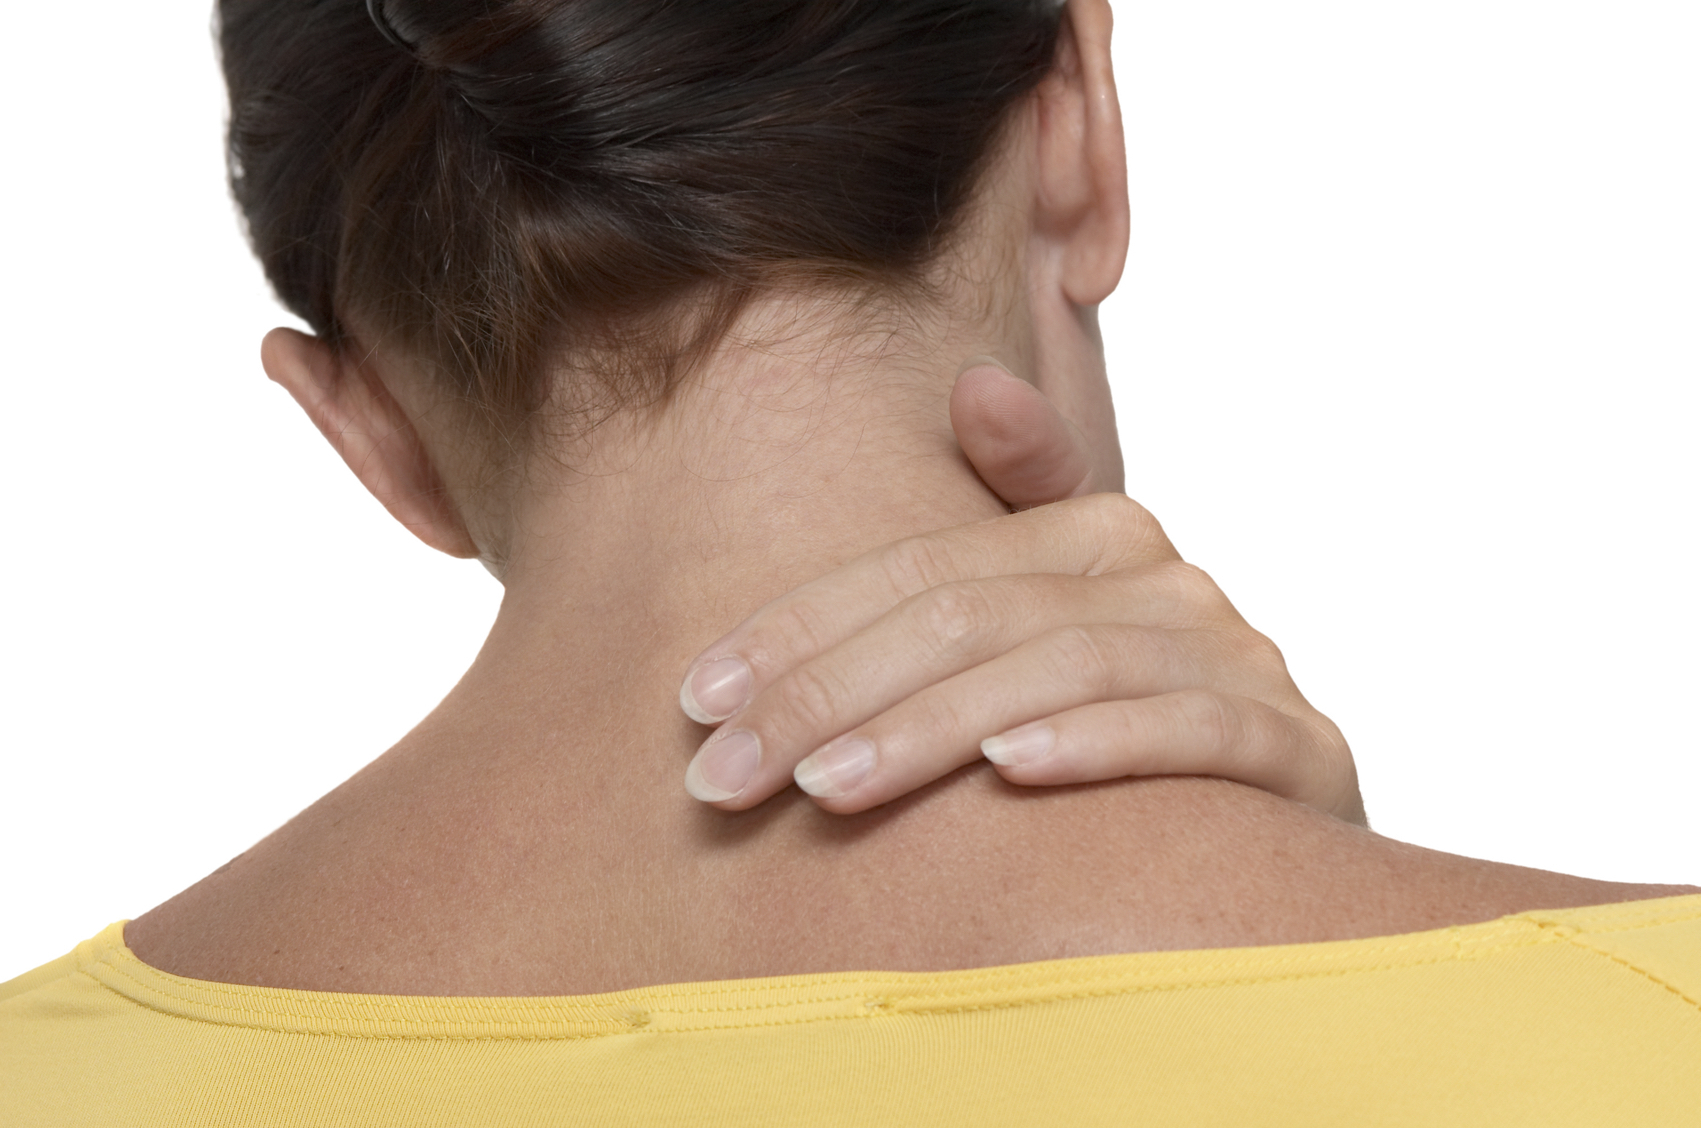 Cervicale: sintomi, cause e rimedi naturali